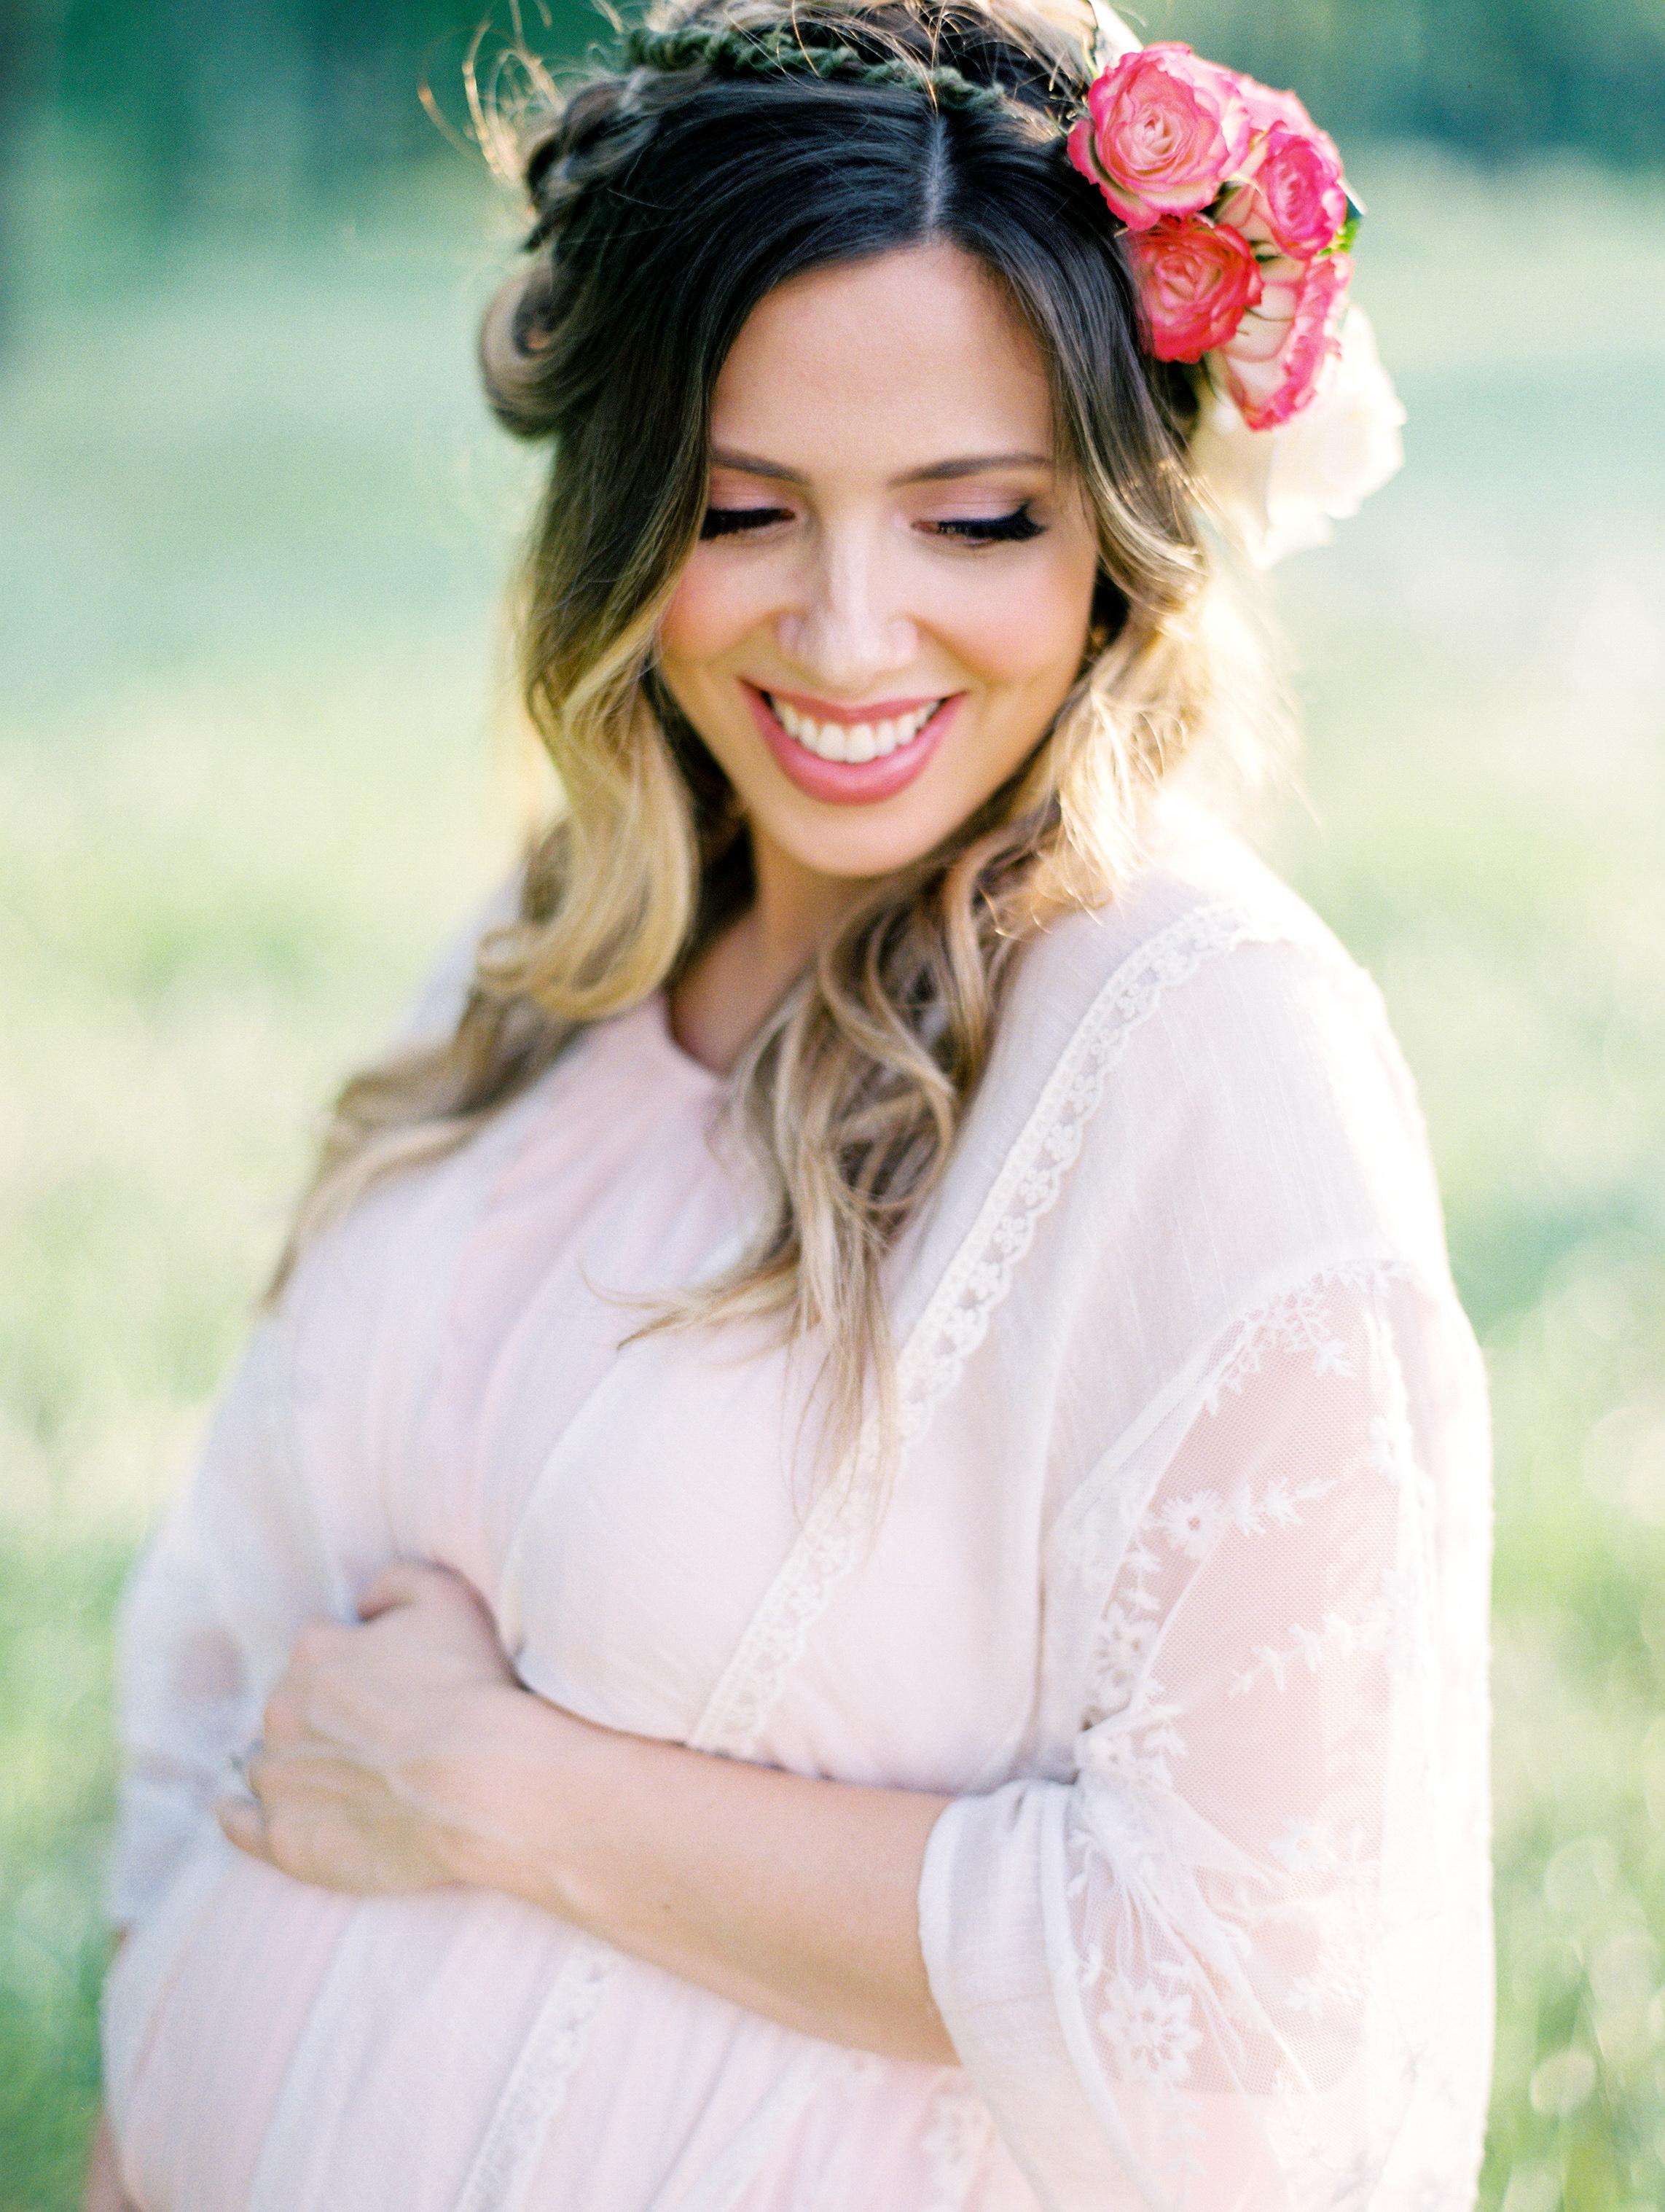 Dana-Fernandez-Photography-Houston-Maternity-Family-Portrait-Photographer-Film-4.jpg